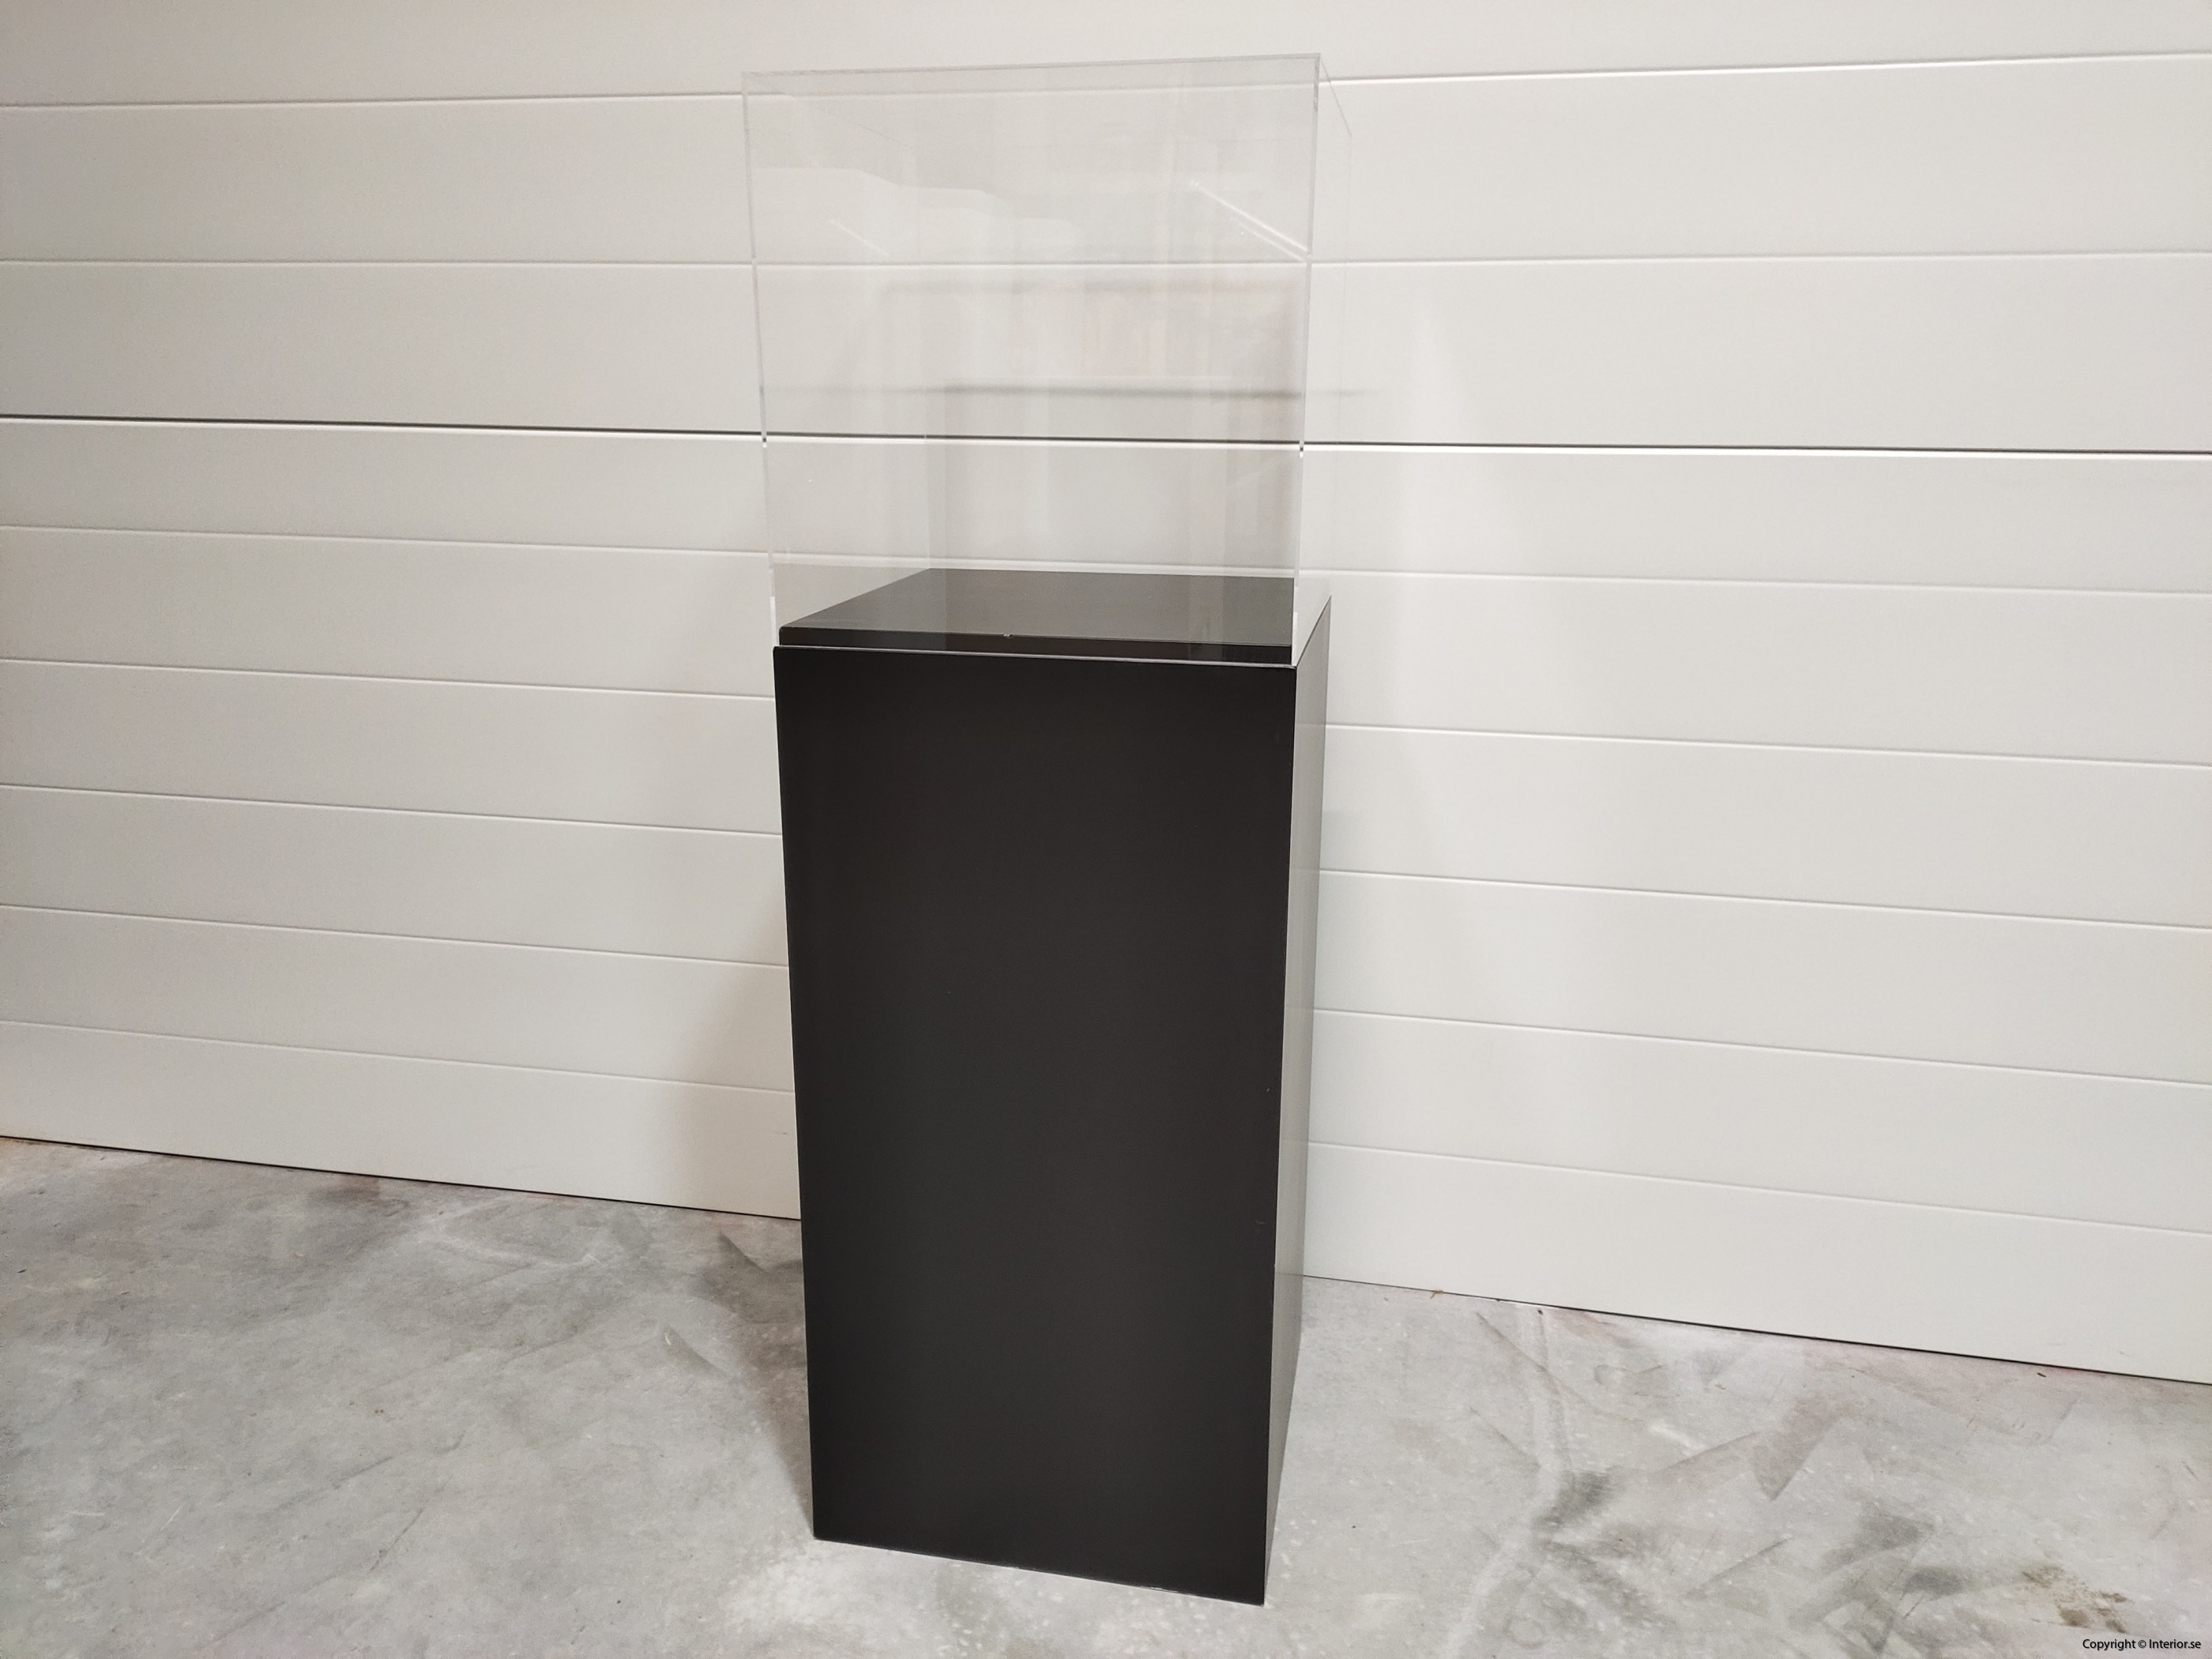 Utställningsmonter  Piedestal - 152 cm hyra monter stockholm (6)